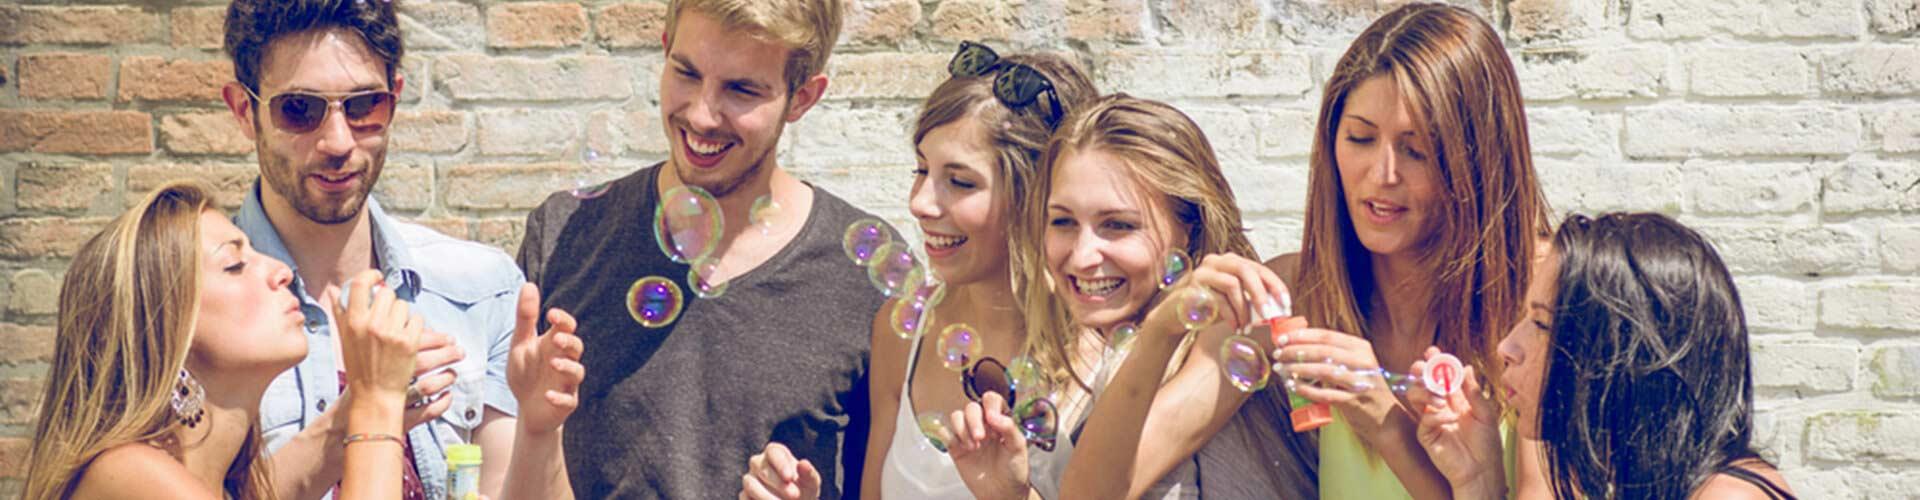 AubergesDeJeunesse.com Auberges De Jeunesse internationales